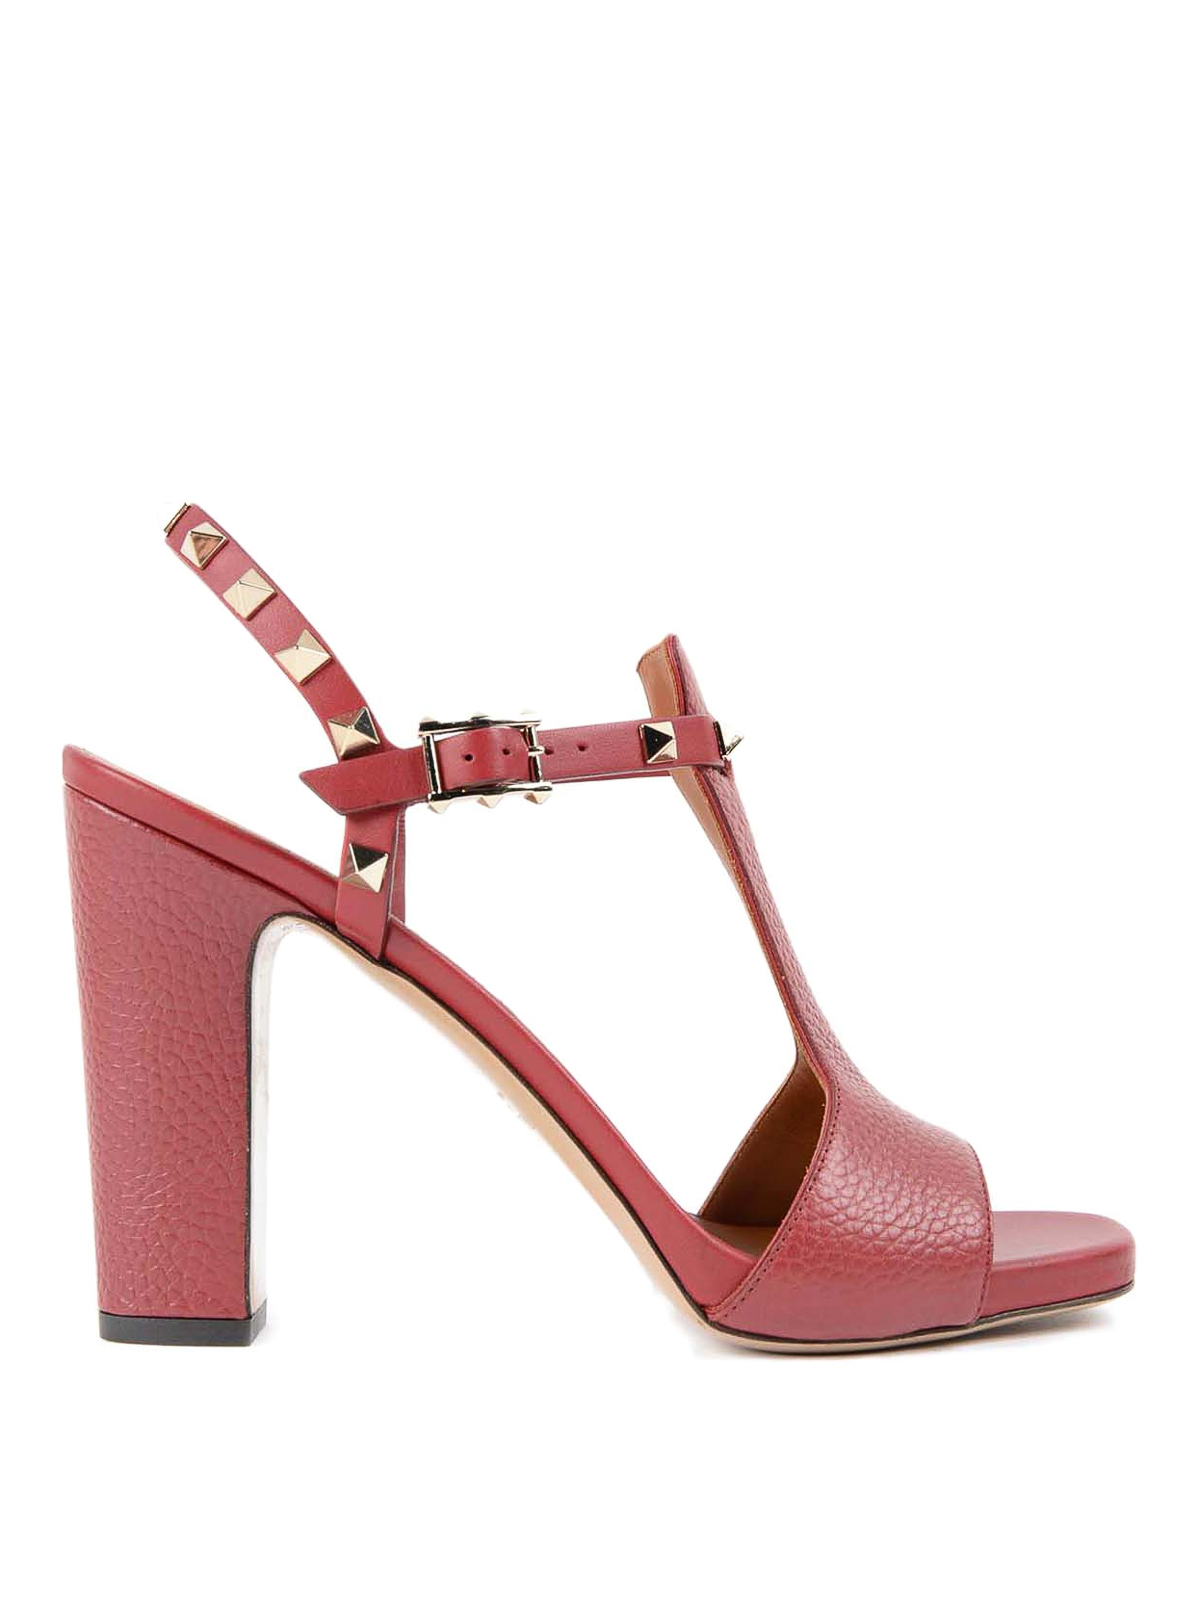 Valentino Rockstud Shoes Online Sale